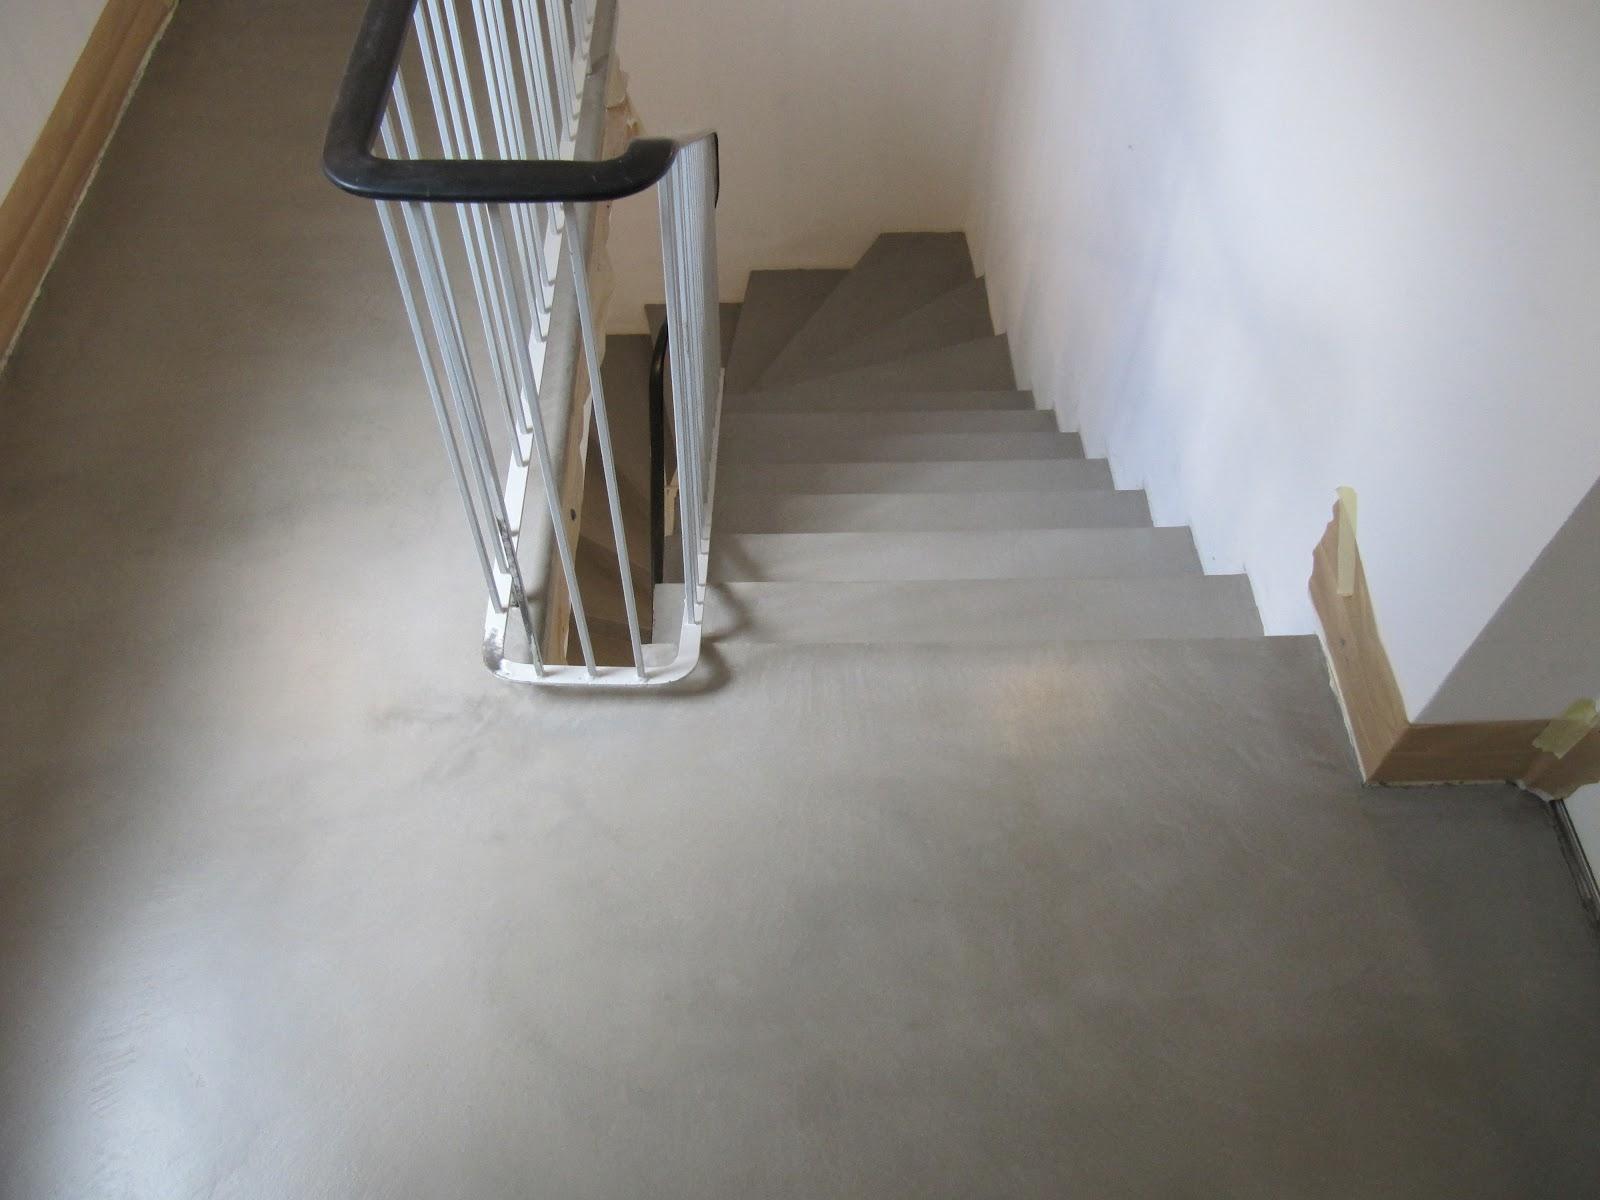 beton unique beton cire betontreppe beton cire. Black Bedroom Furniture Sets. Home Design Ideas